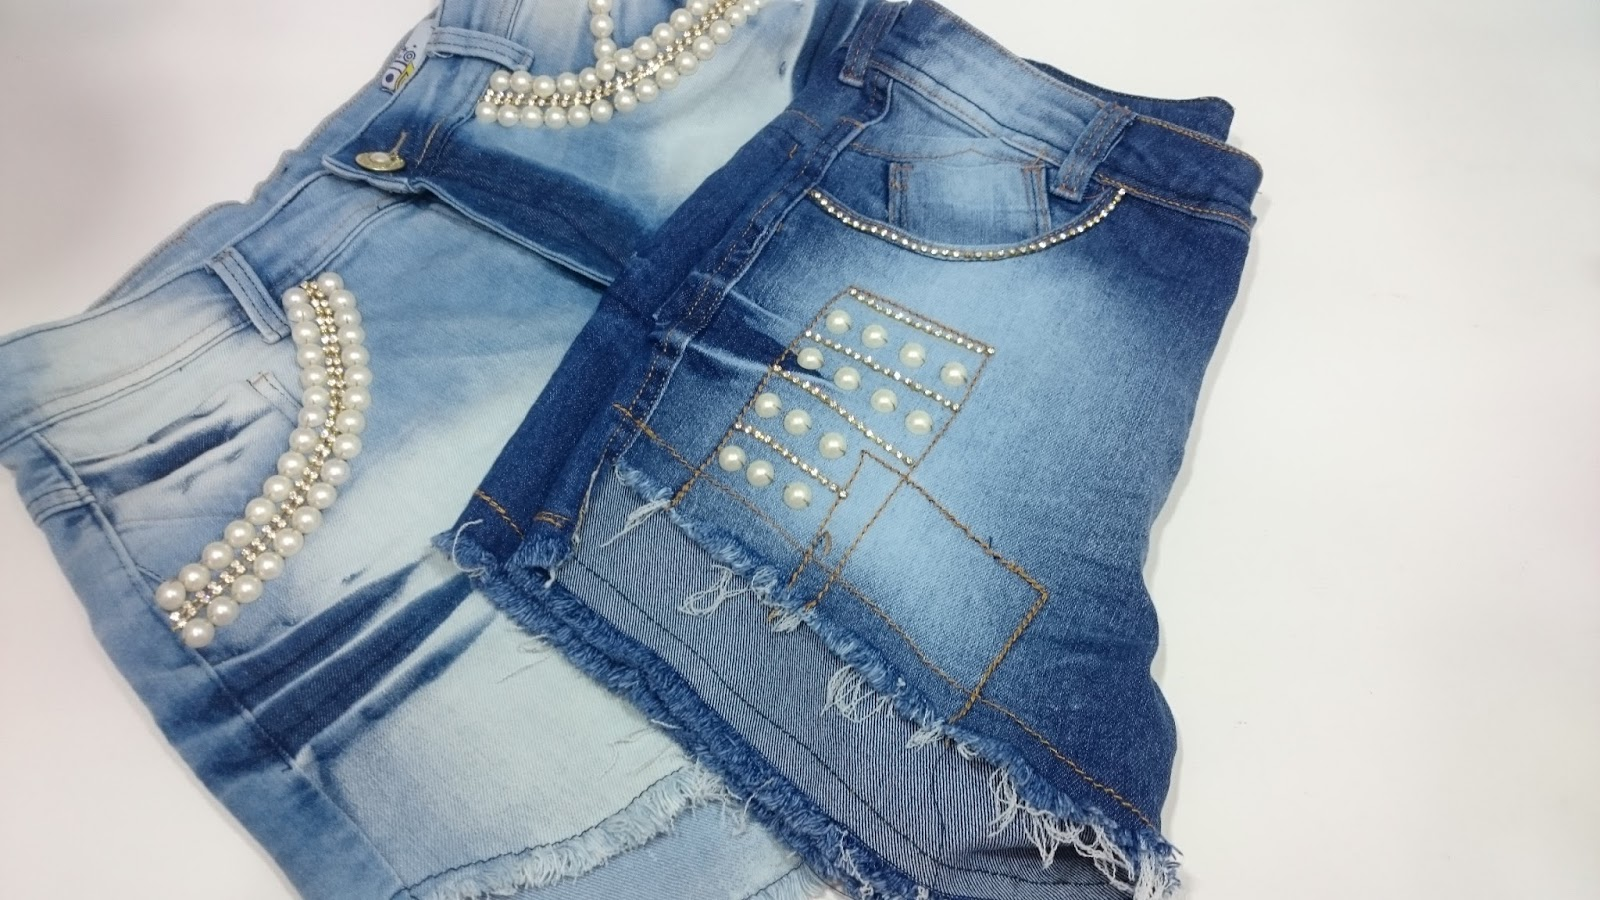 Armario Japones Barato ~ Artesanato Viviane Magalh u00e3es Como Customizar seu Jeans de Modo Rápido e Fácil